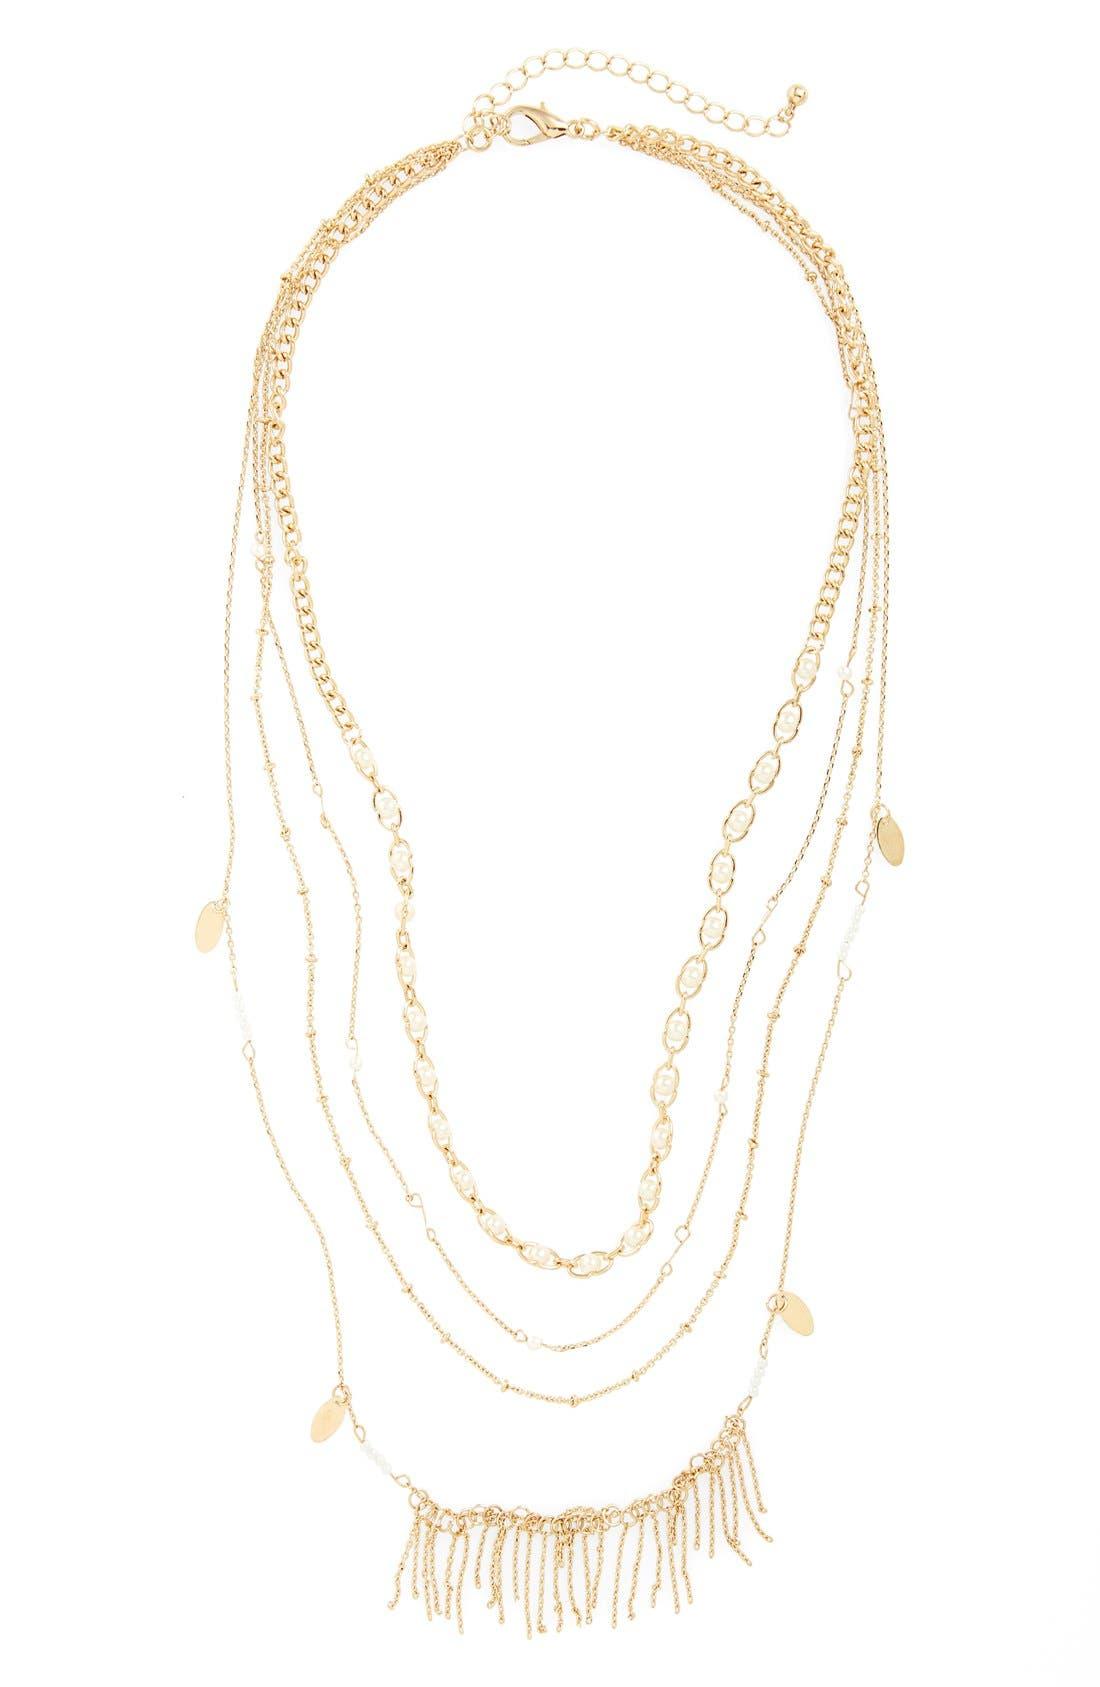 Main Image - Panacea Faux Pearl & Fringe Layered Necklace